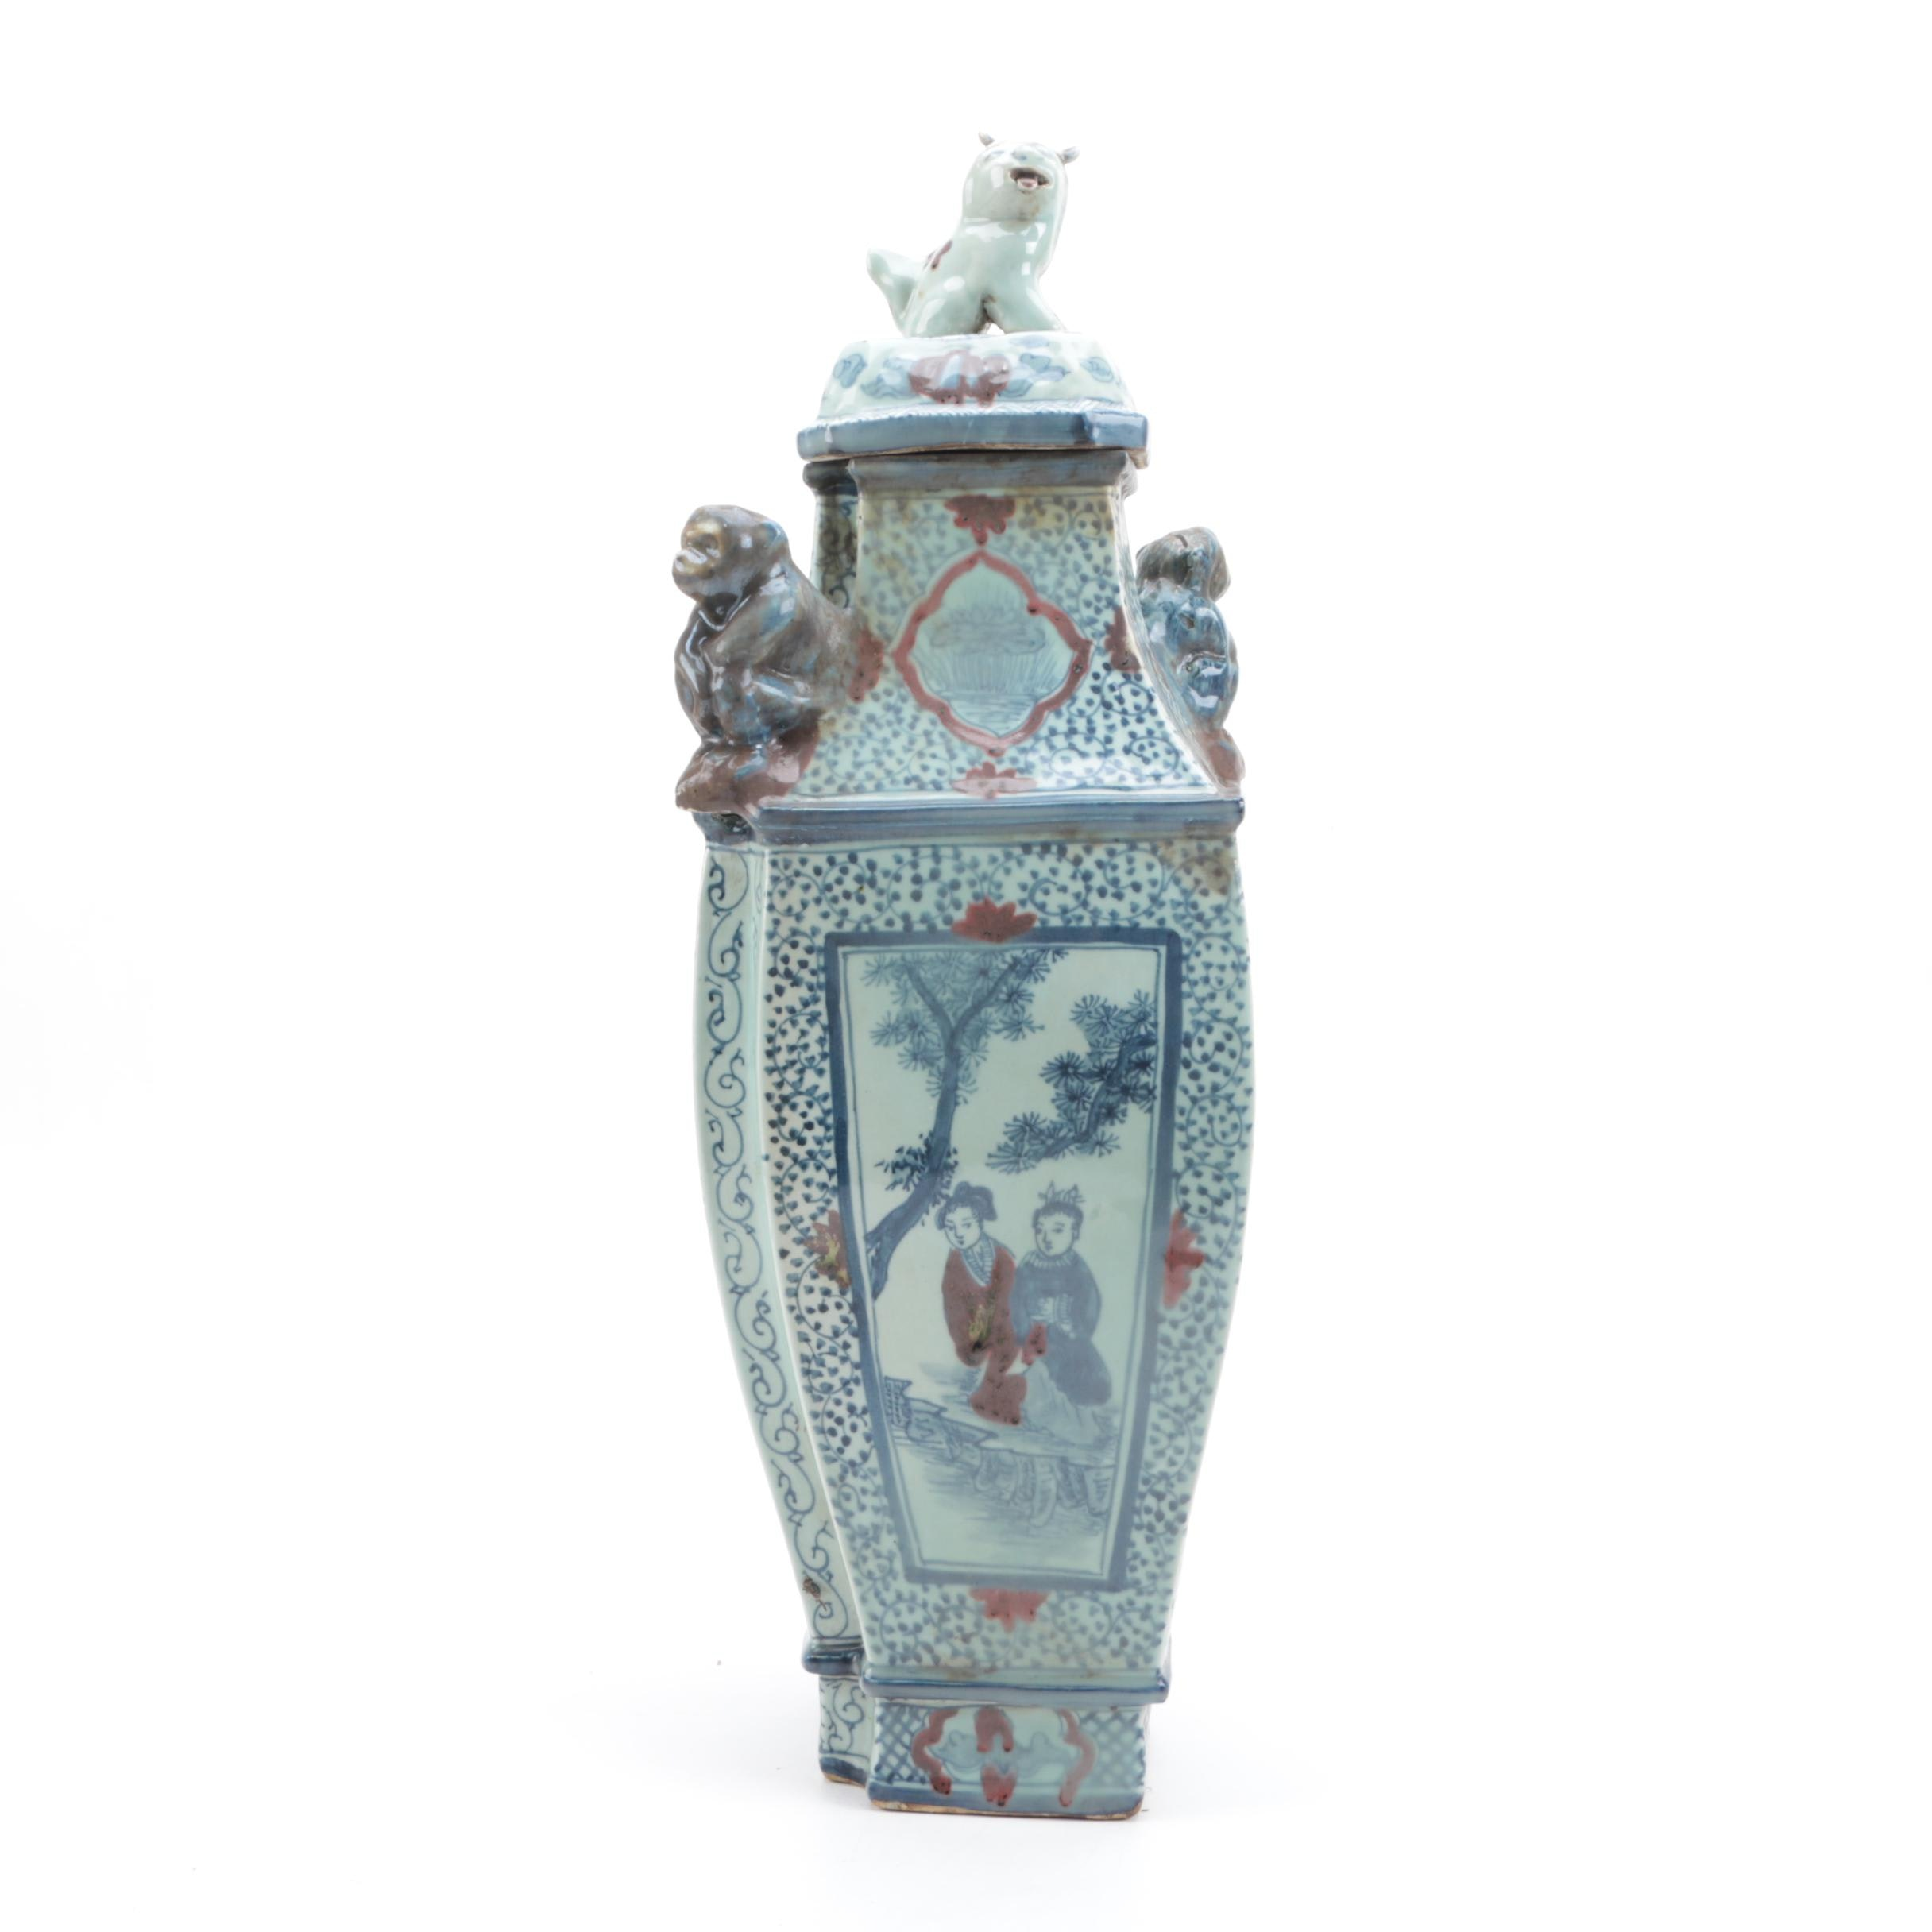 Chinese Ceramic Jar